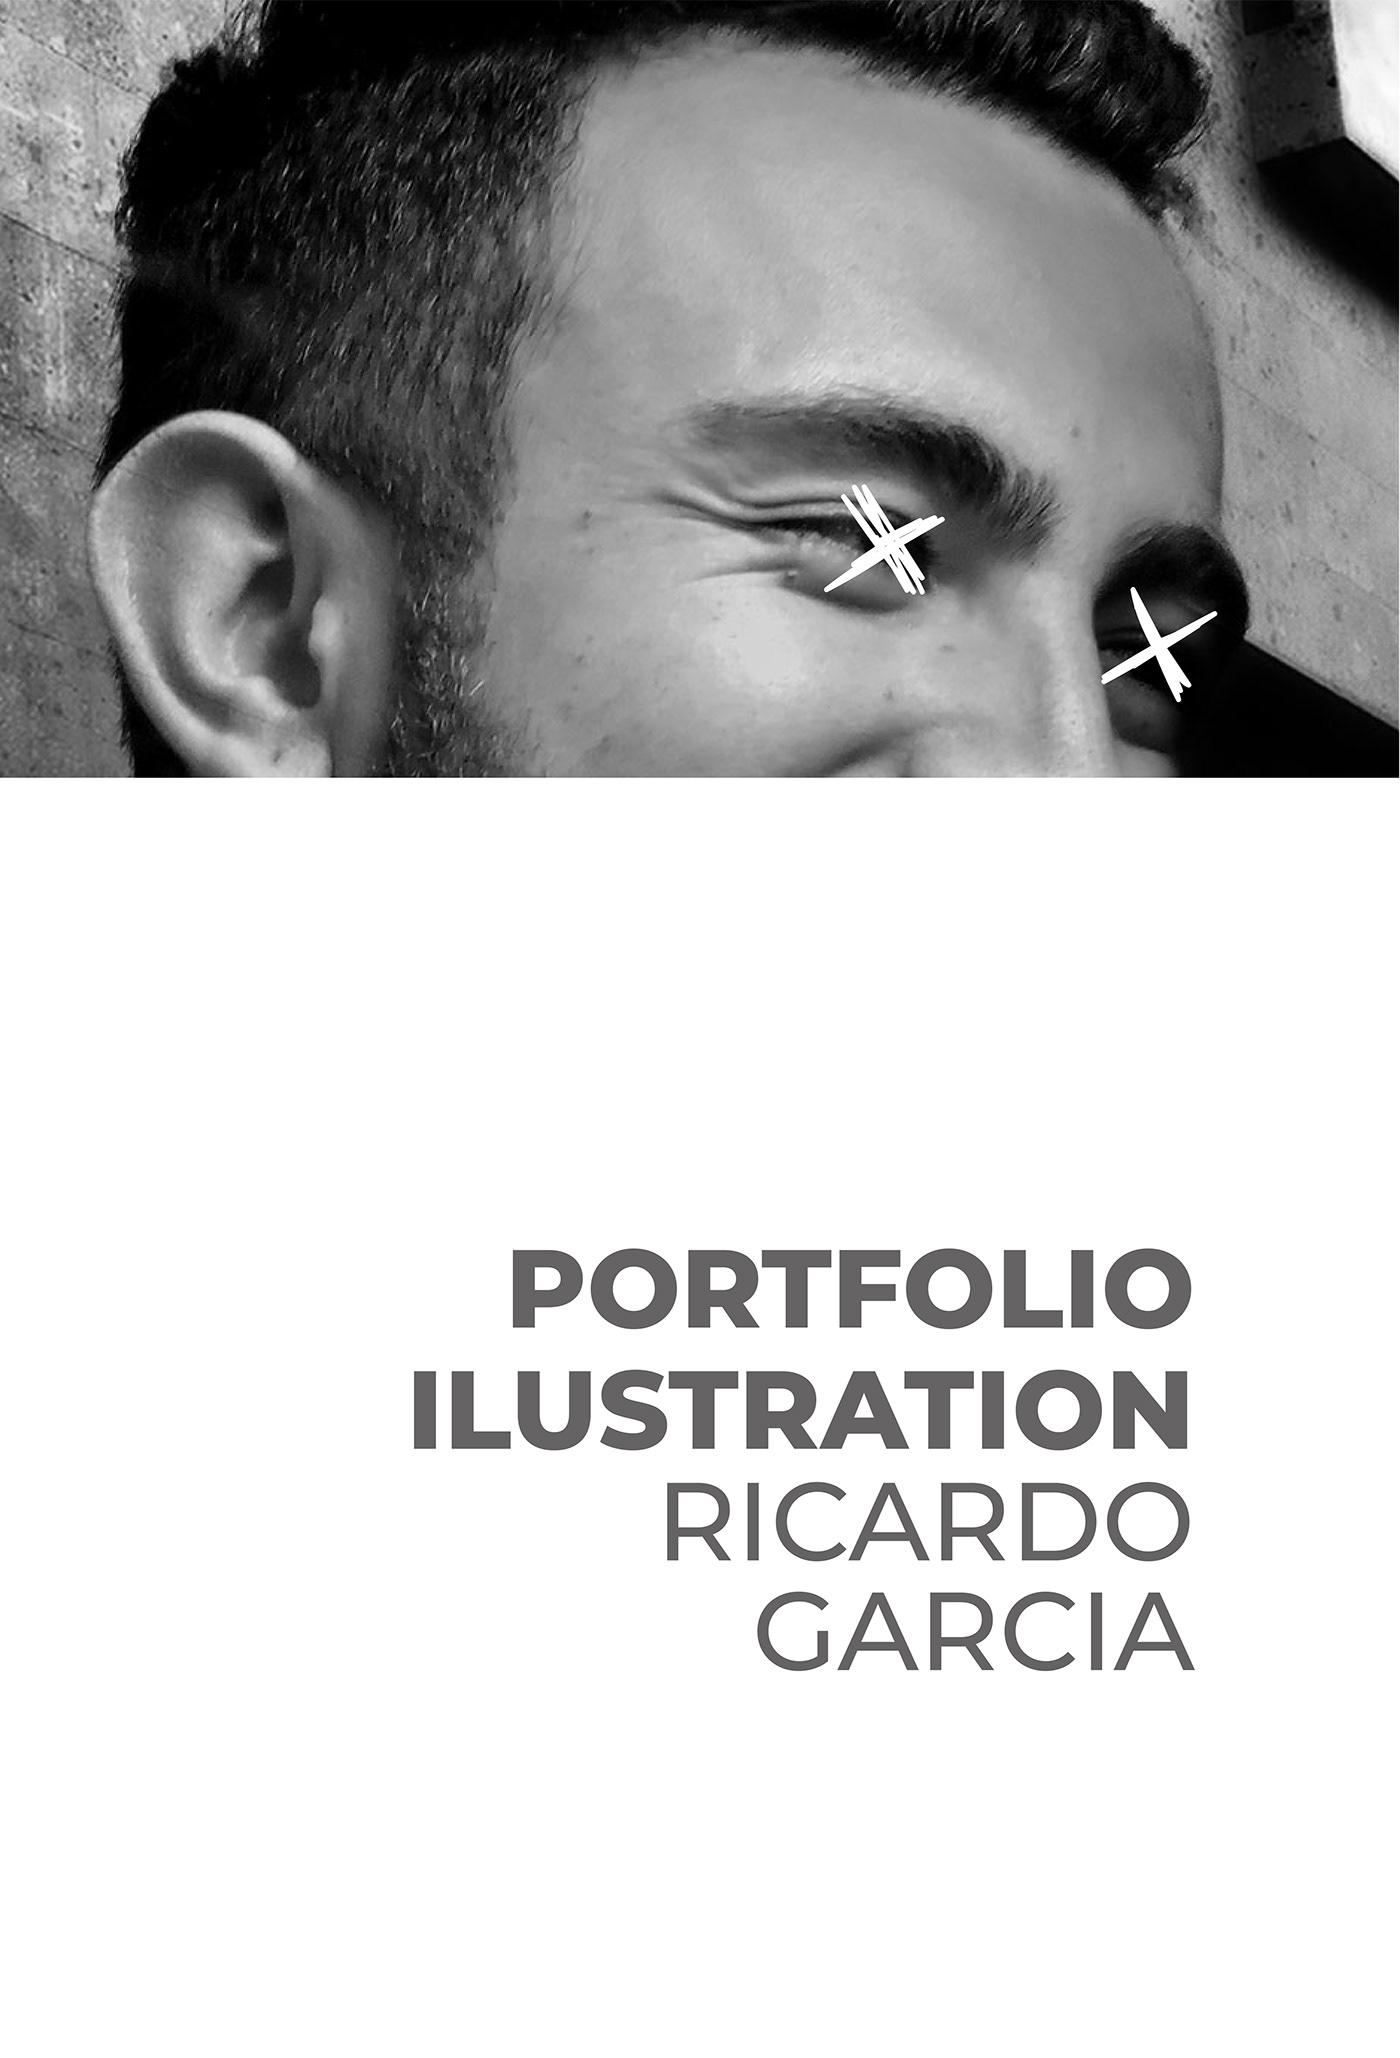 artwork design dessin draw Drawing  graphic graphic design  graphique ilustration